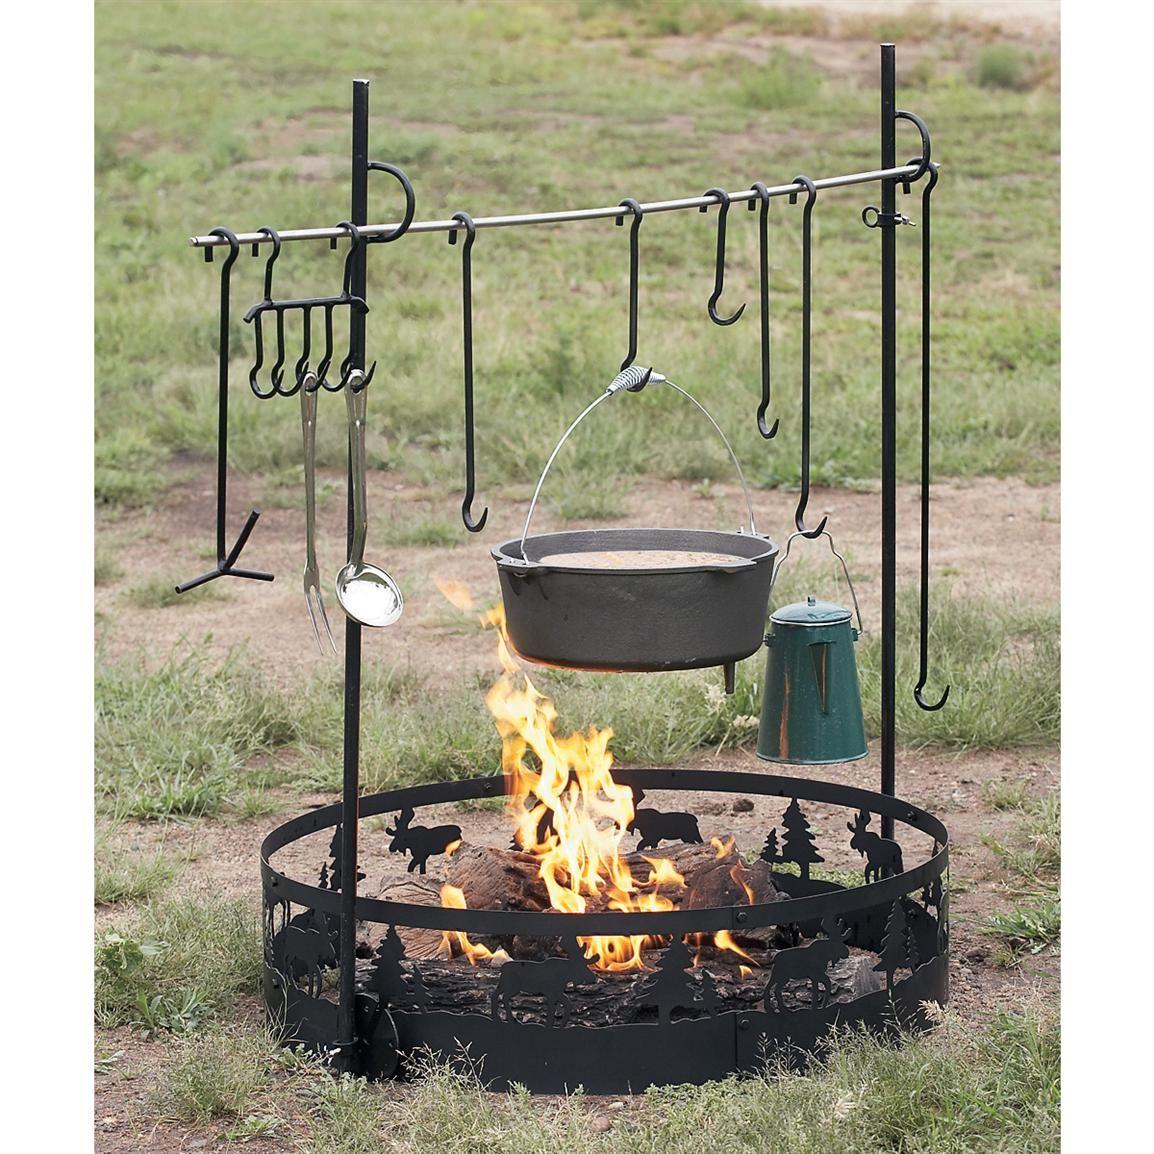 Guide Gear® Triangle Dinner Bell - 128921, Cookware & Utensils at ...